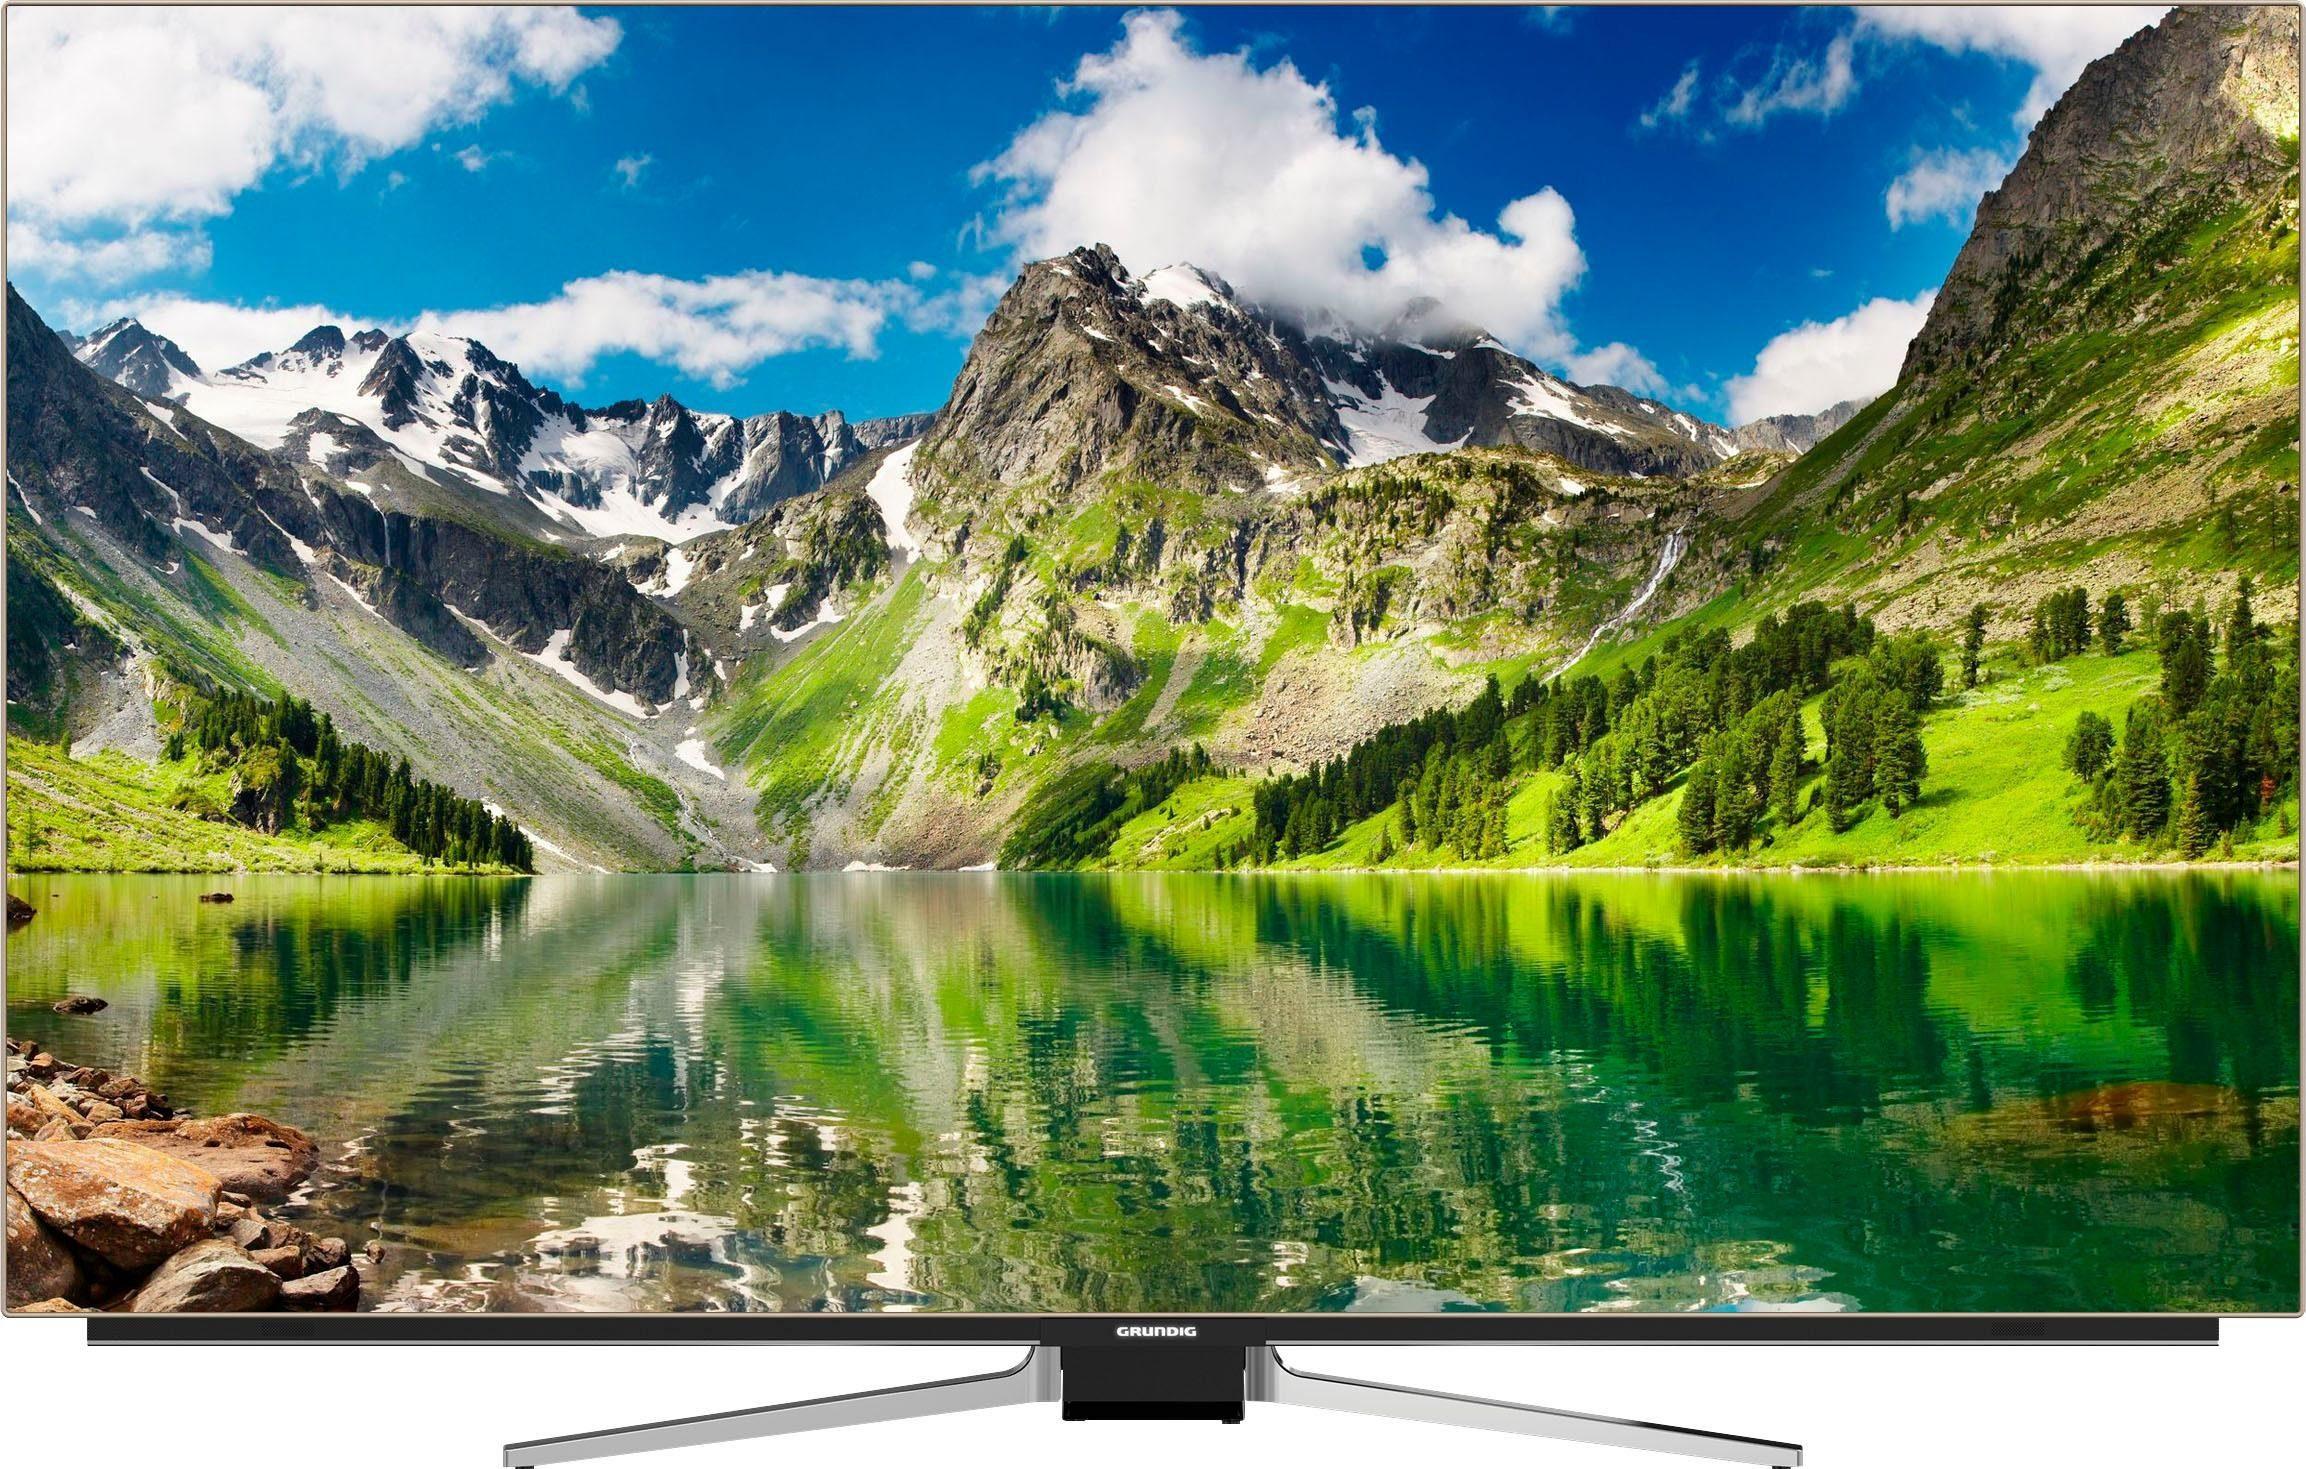 Grundig 65VLO9500BP OLED-Fernseher (164 cm/65 Zoll, 4K Ultra HD, Smart-TV)